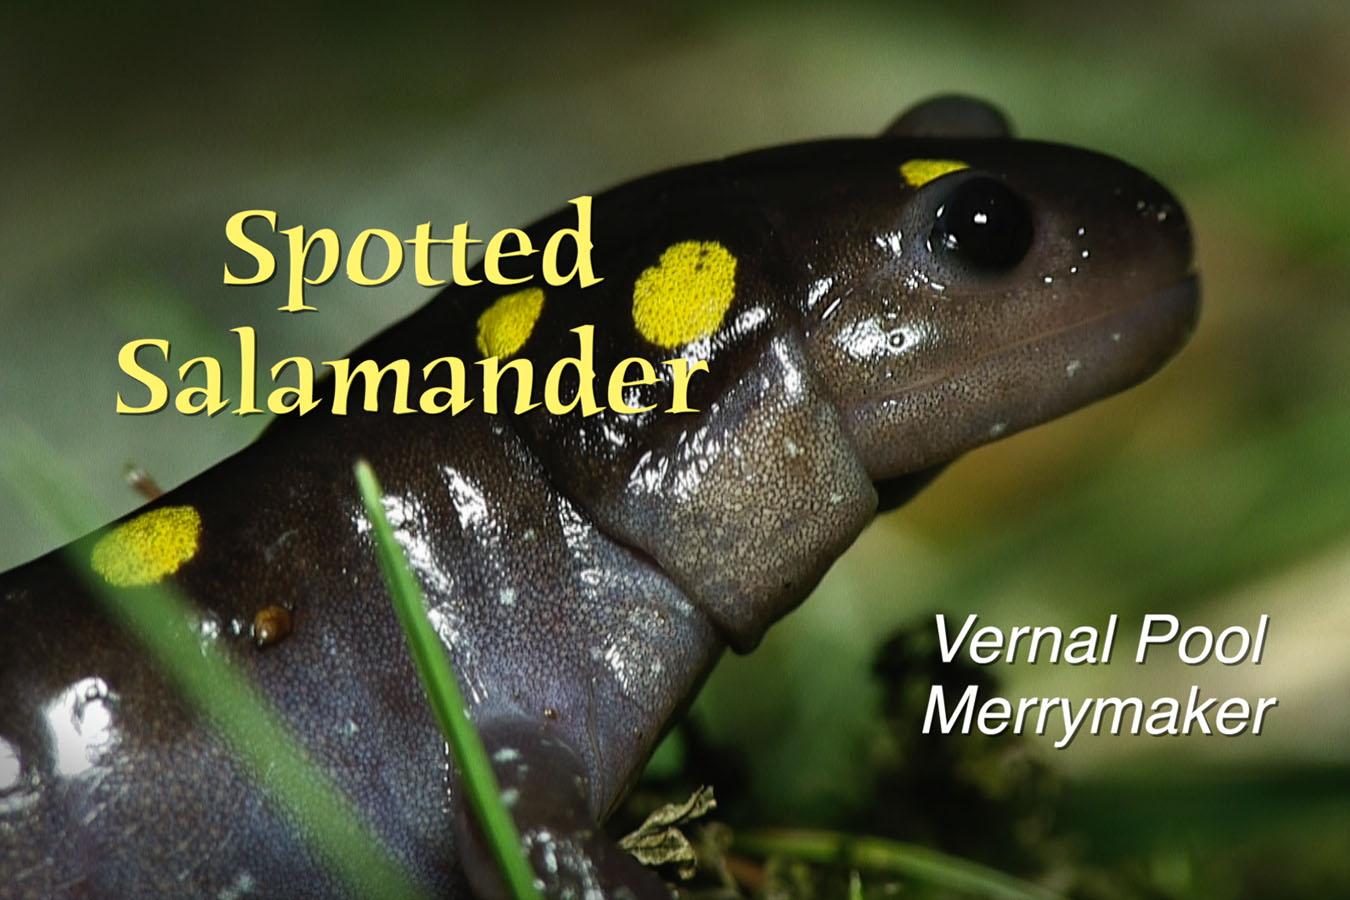 Spotted Salamander - featured image © Lang Elliott